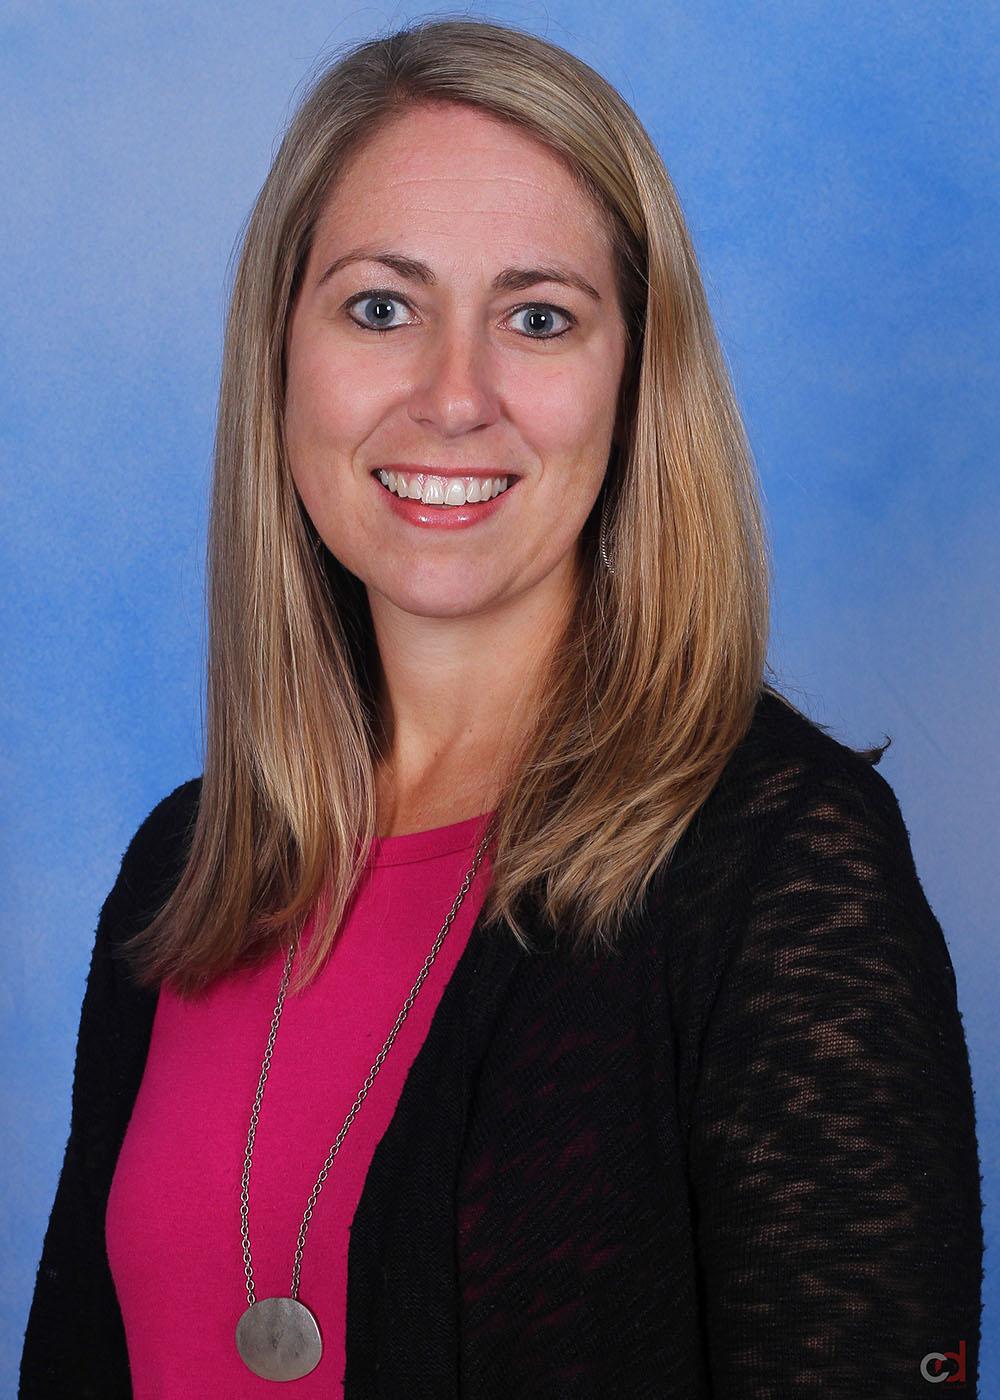 Ms. Carolyn Wade